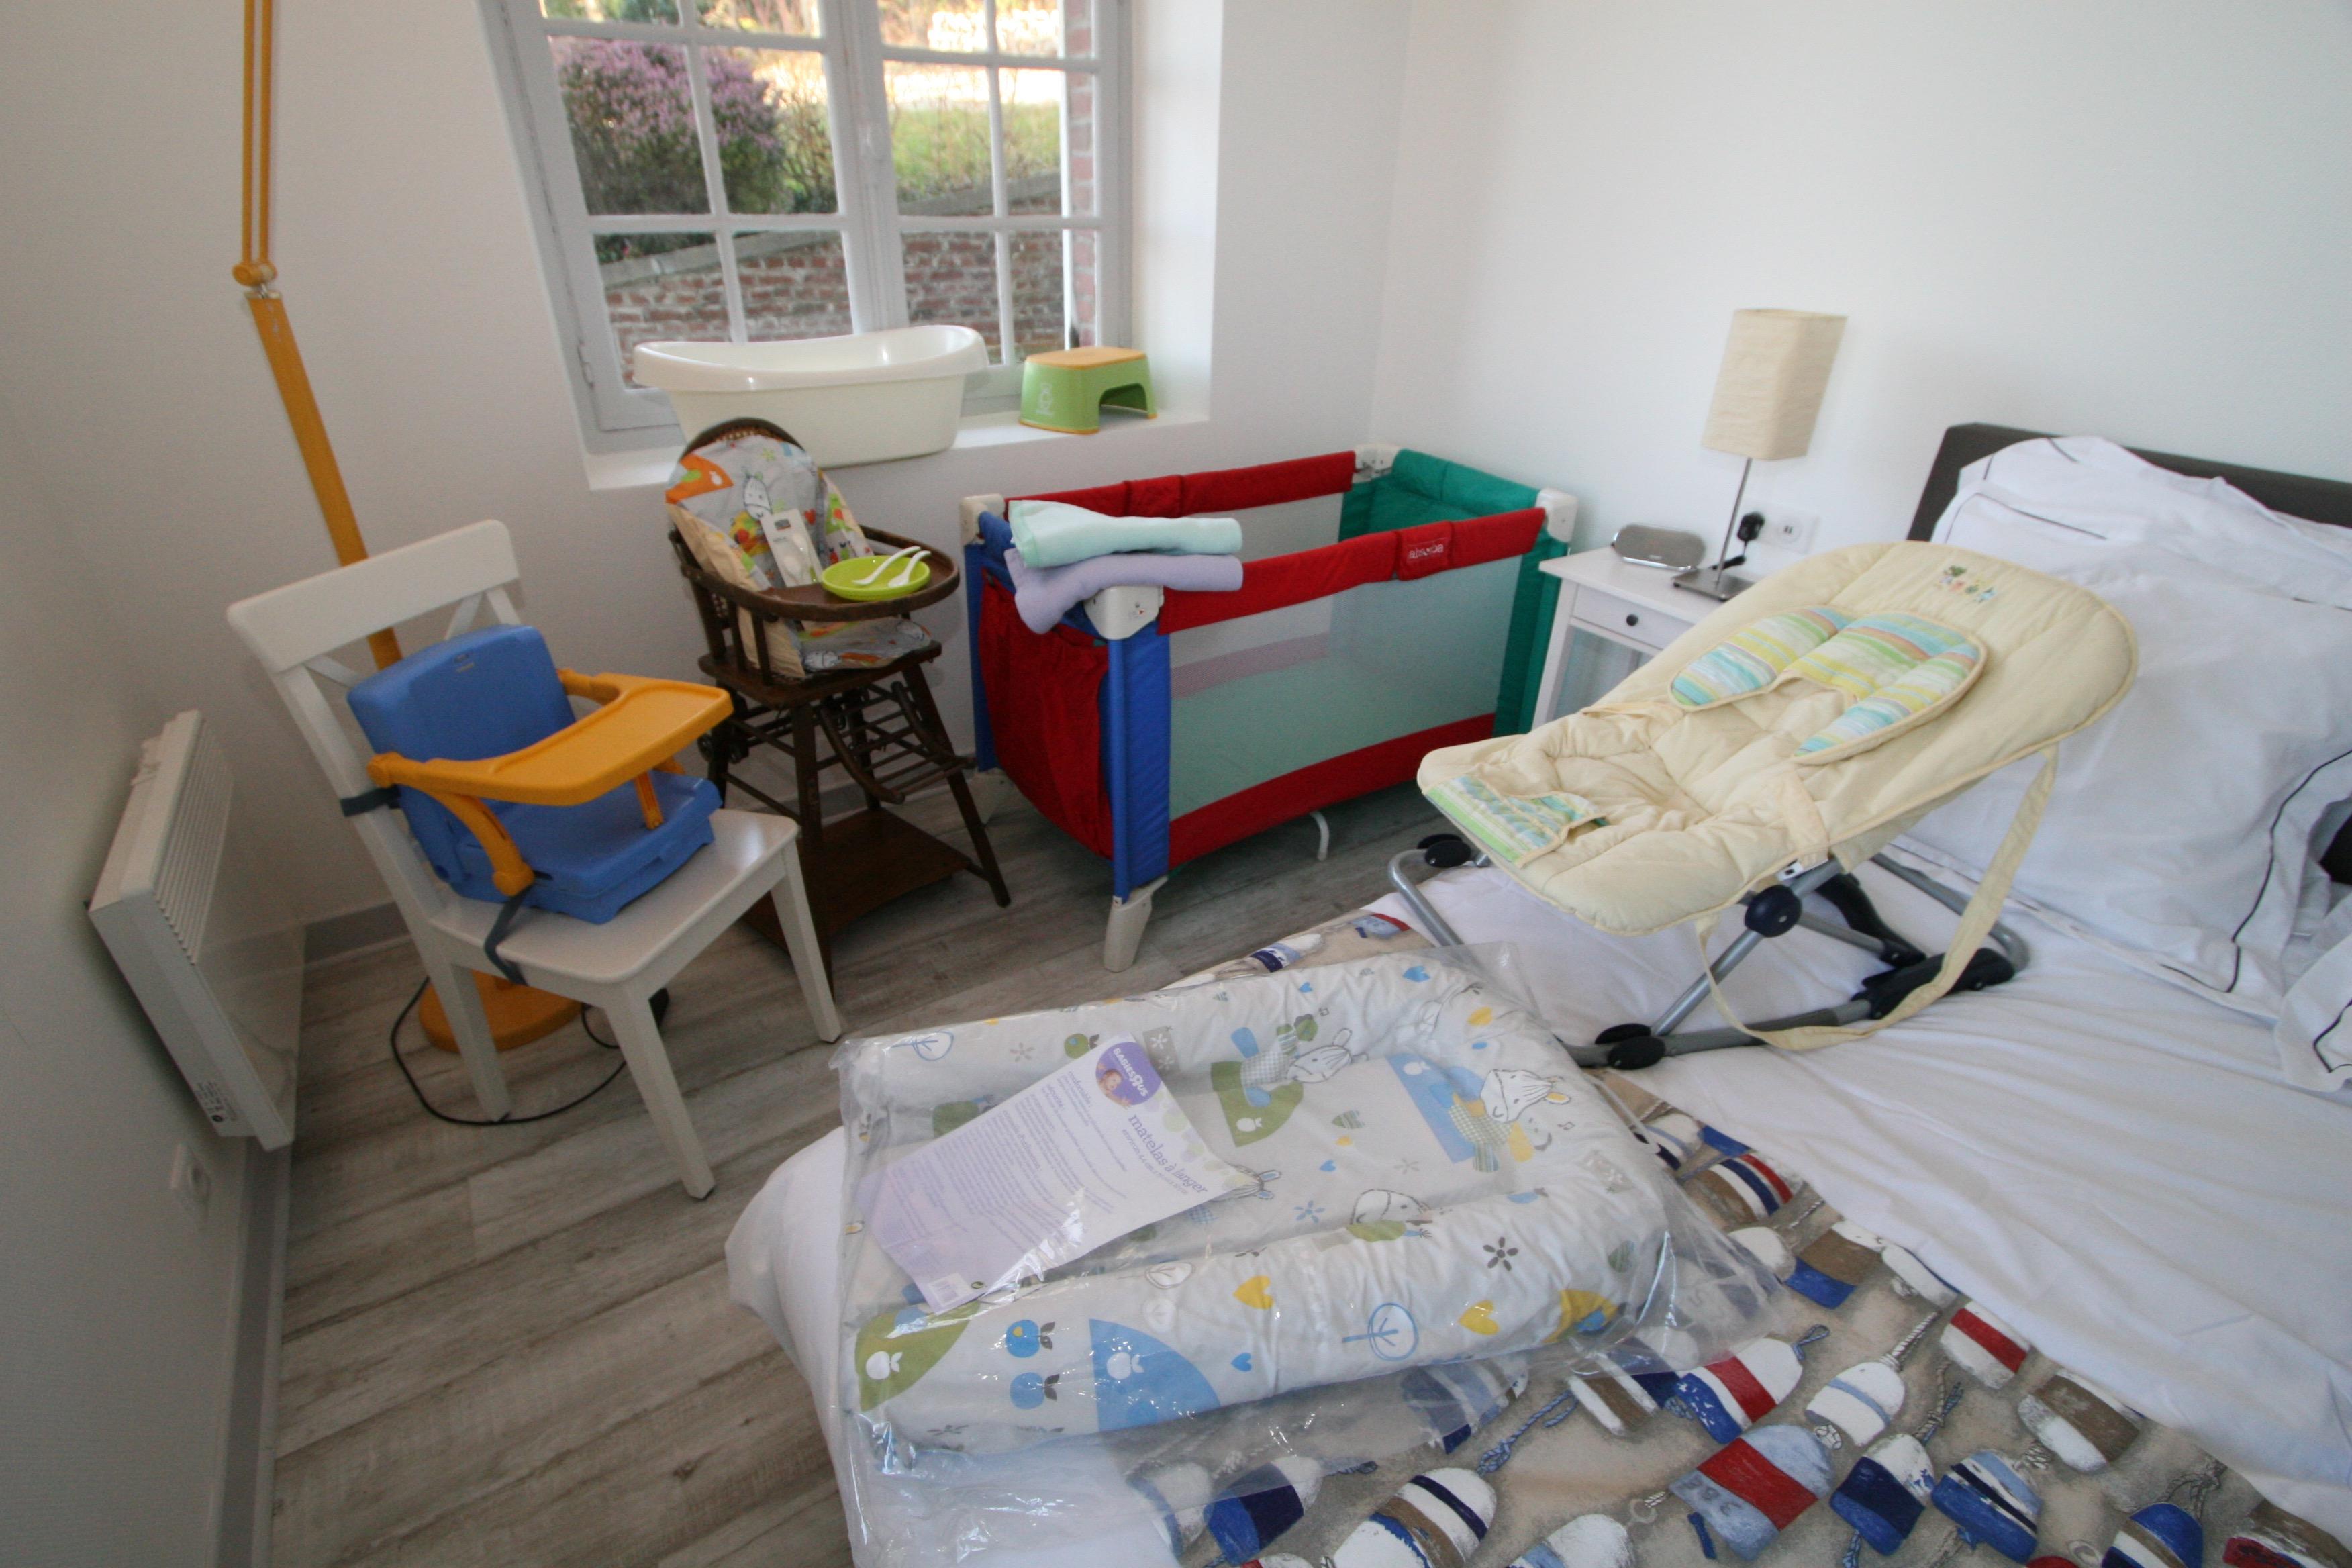 free dispose duune laverie avec lave linge et sche linge with seche linge appartement. Black Bedroom Furniture Sets. Home Design Ideas